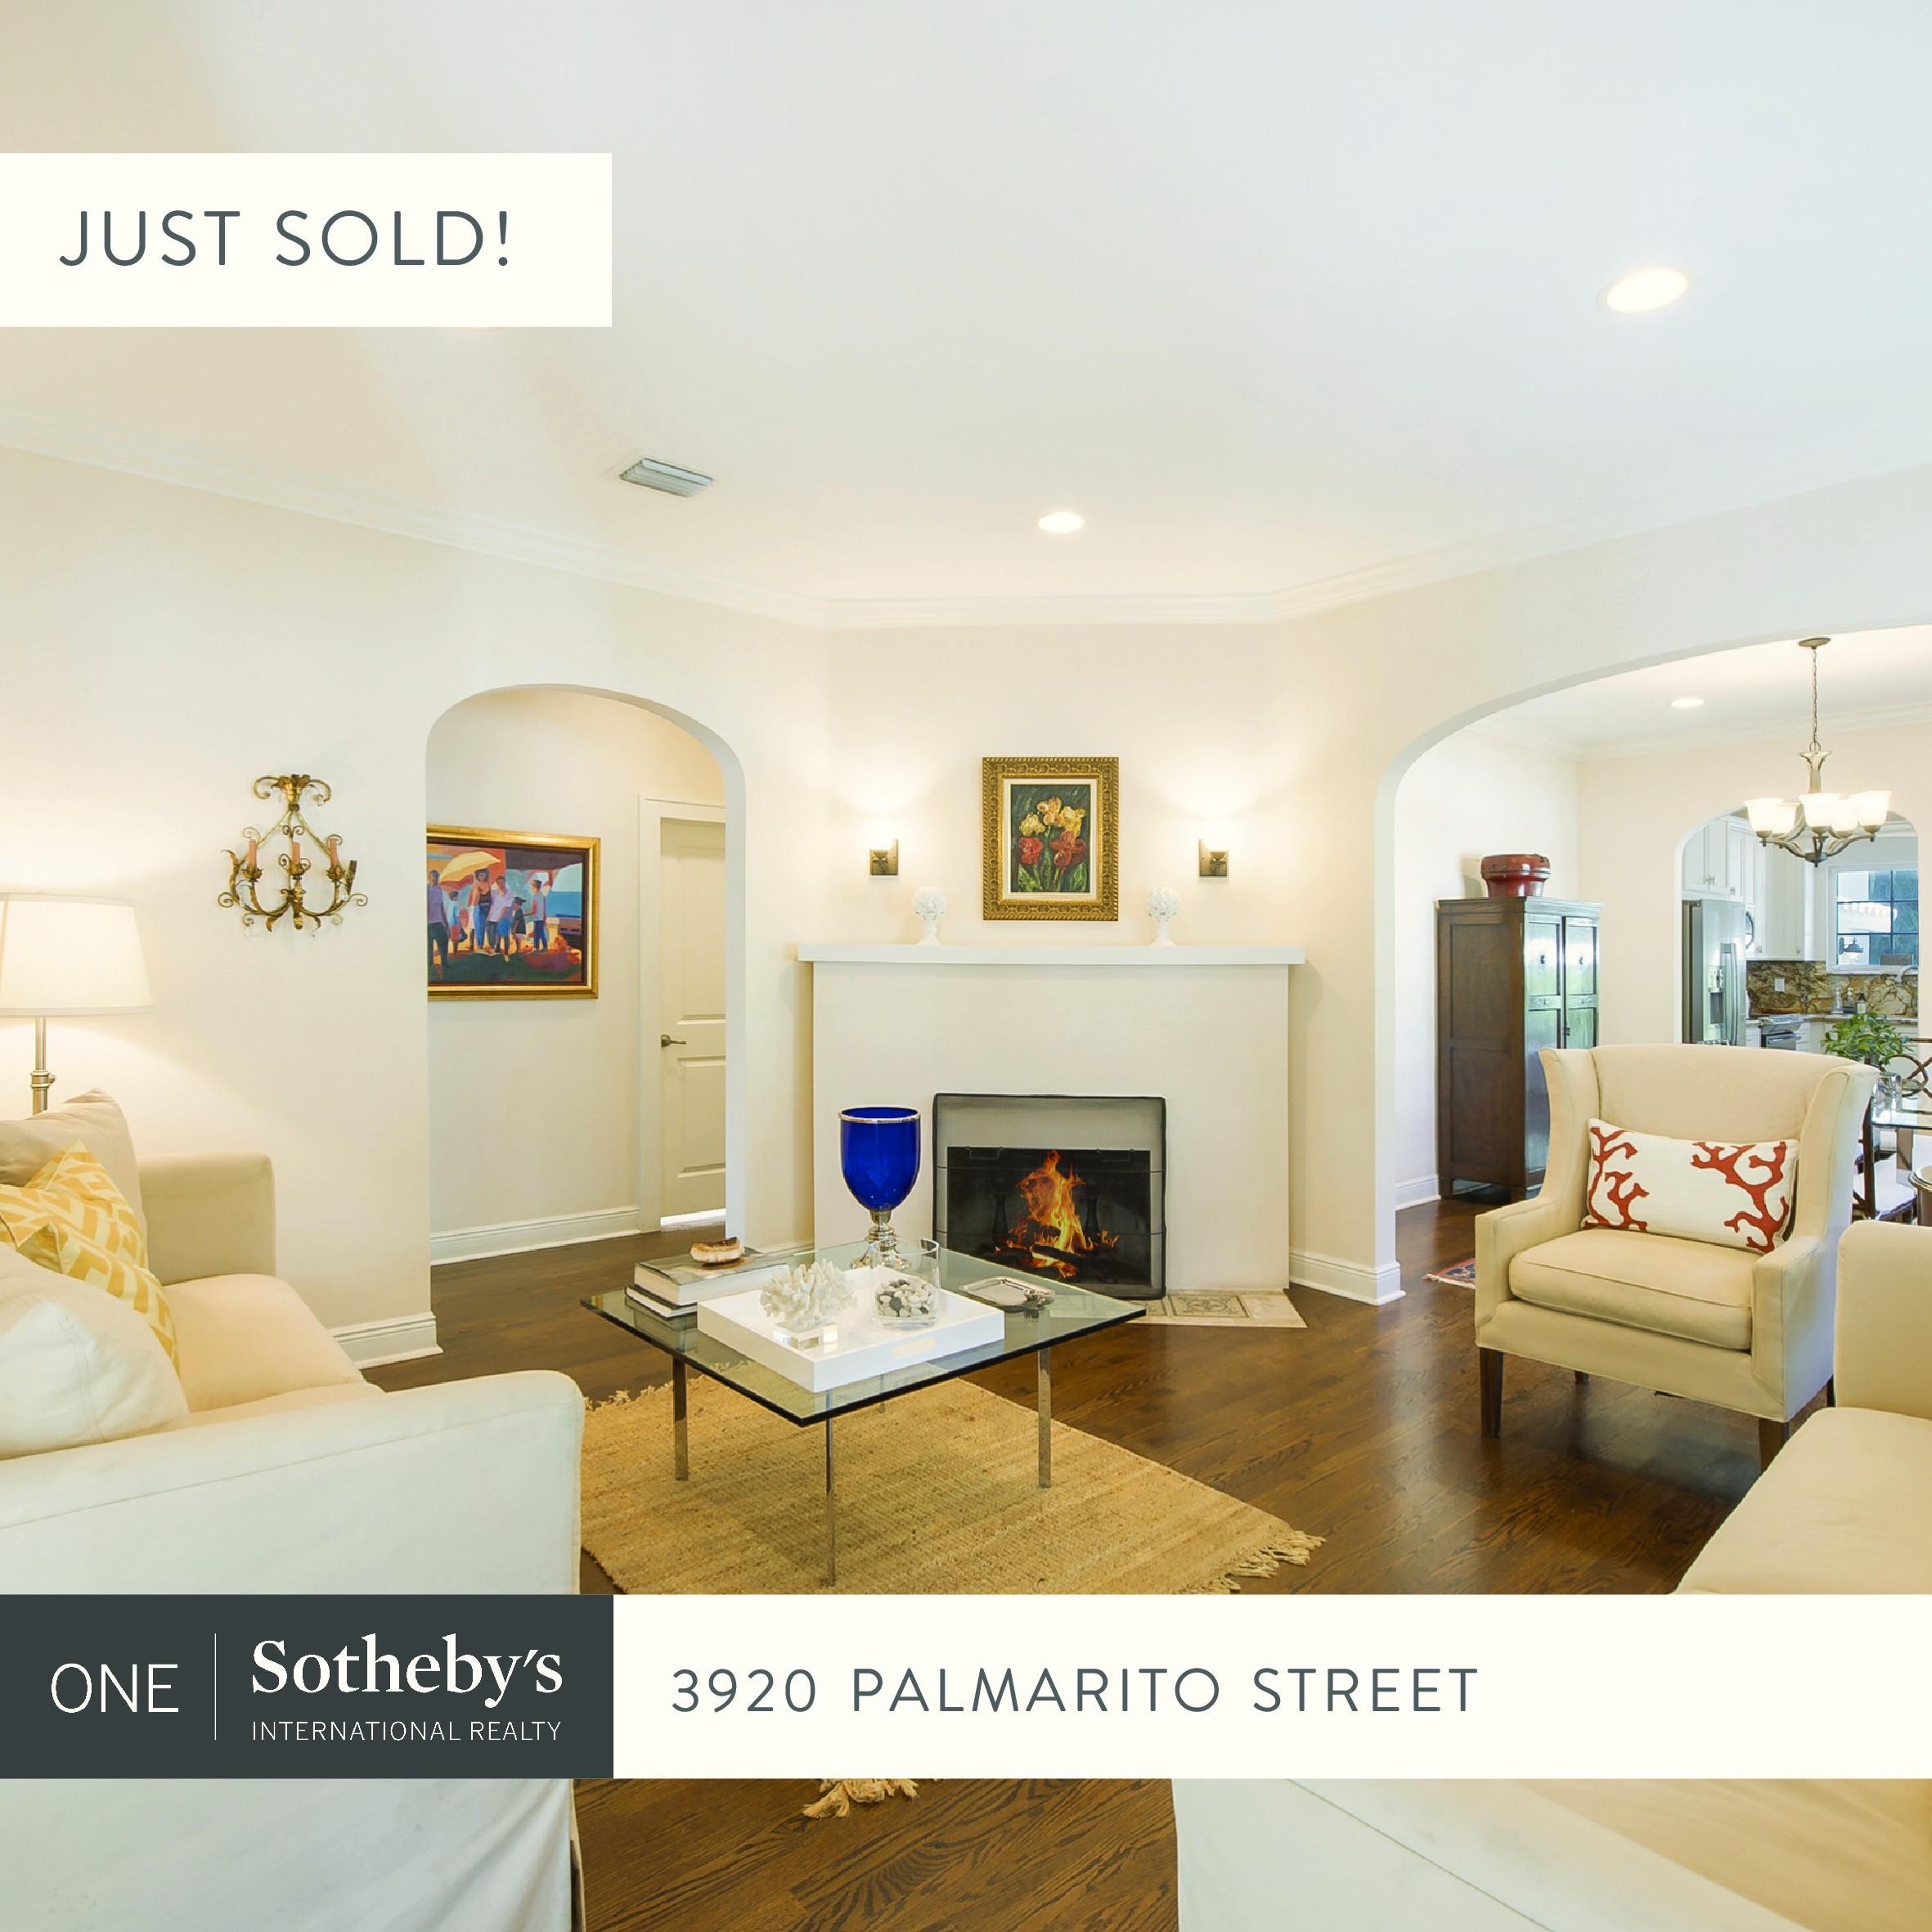 JUST SOLD! 3920 Palmarito Street, Coral Gables, FL